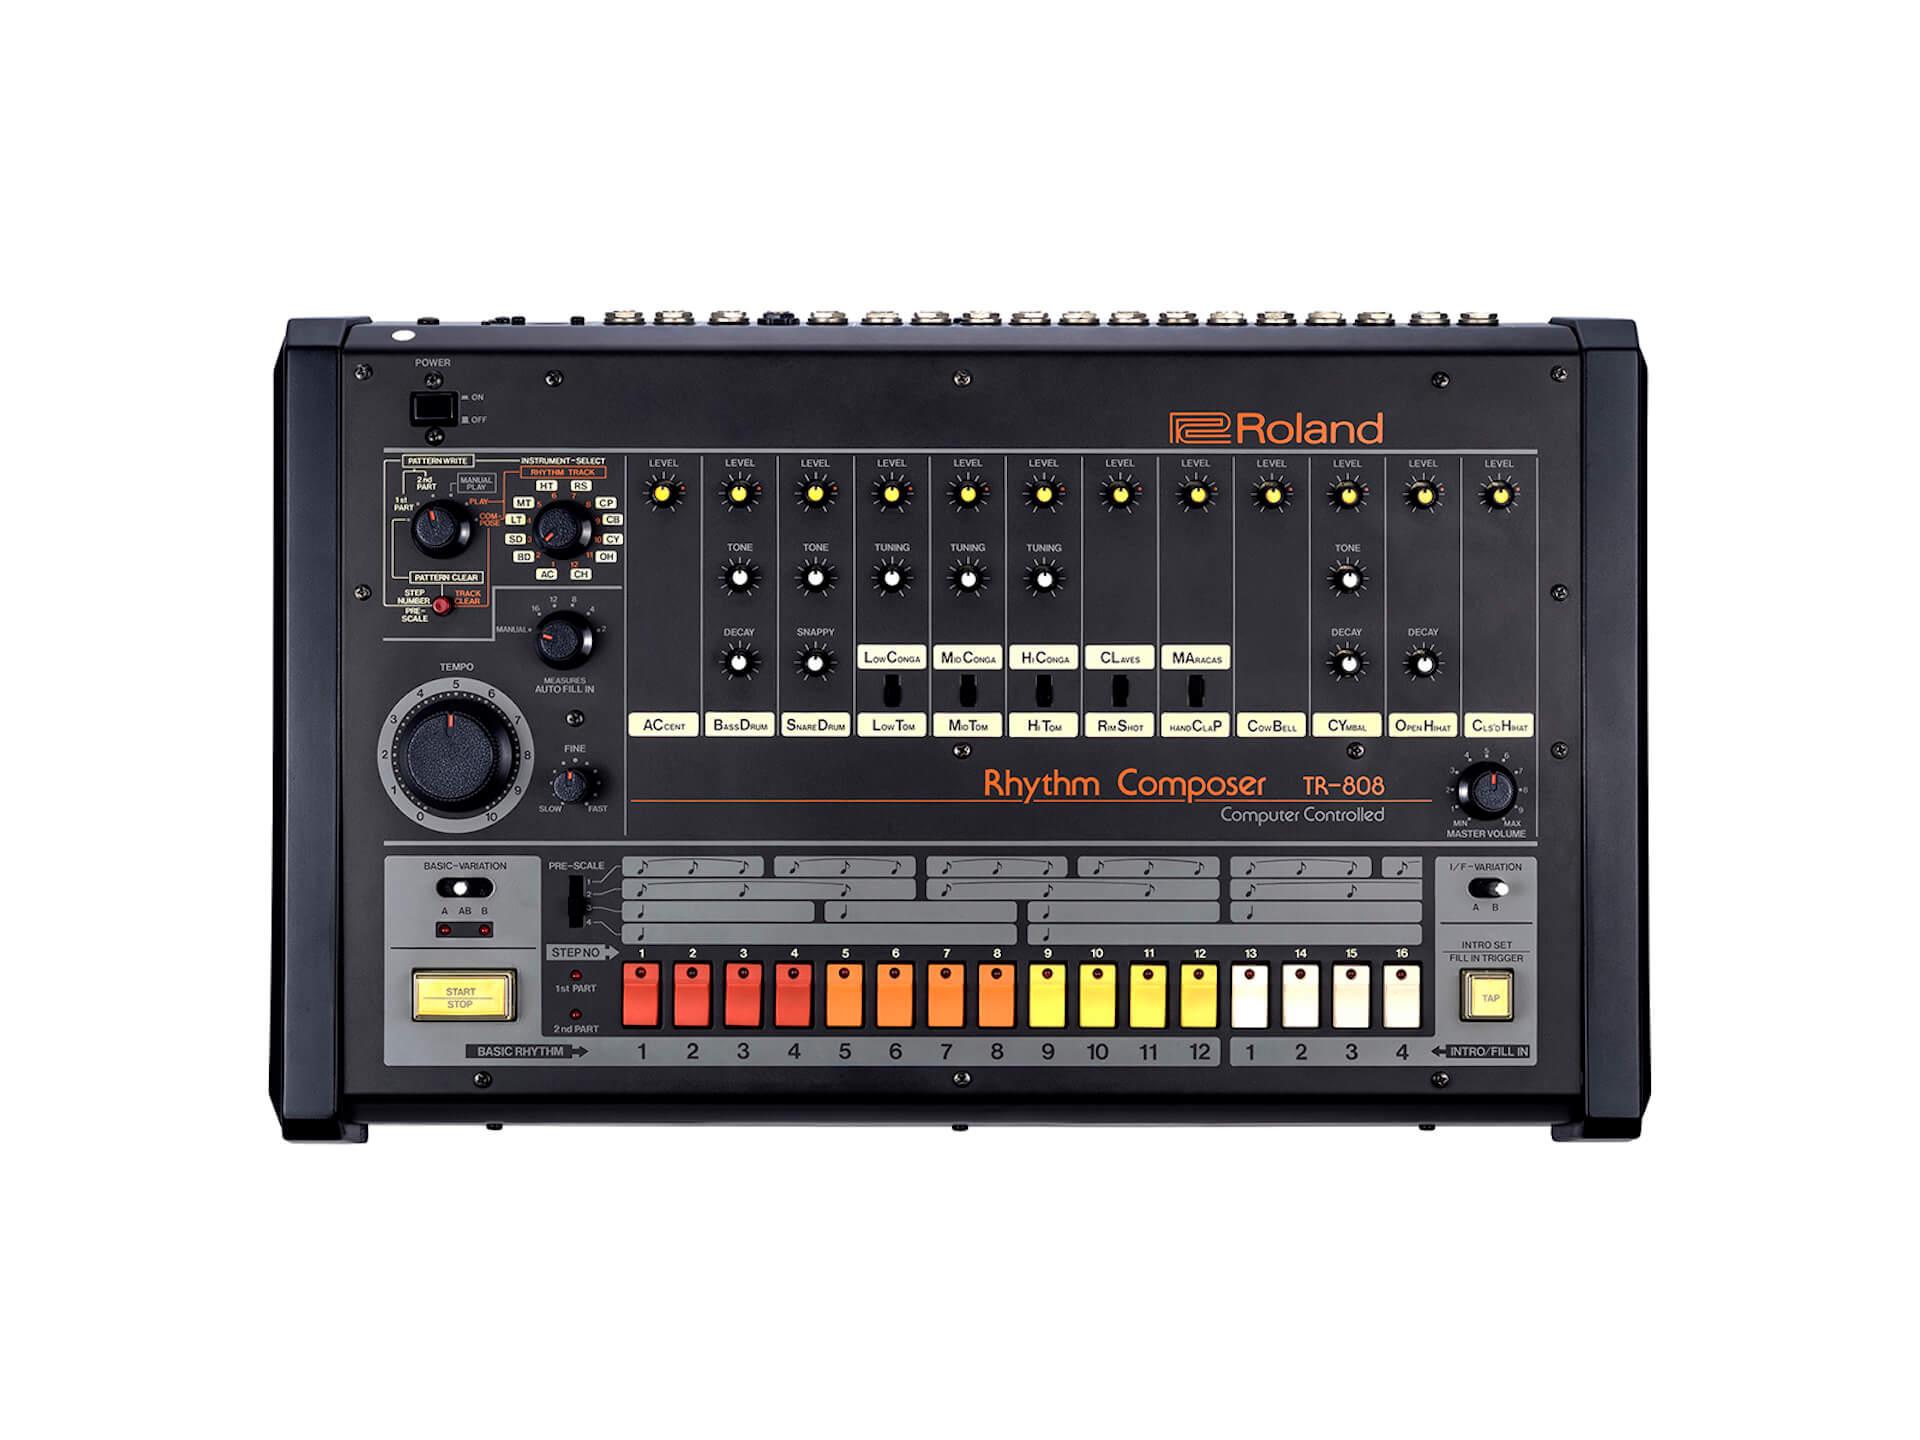 Rolandのリズムマシン『TR-808』が「重要科学技術史資料」に登録|電子楽器として史上初の快挙に art-culture190906-tr808-1